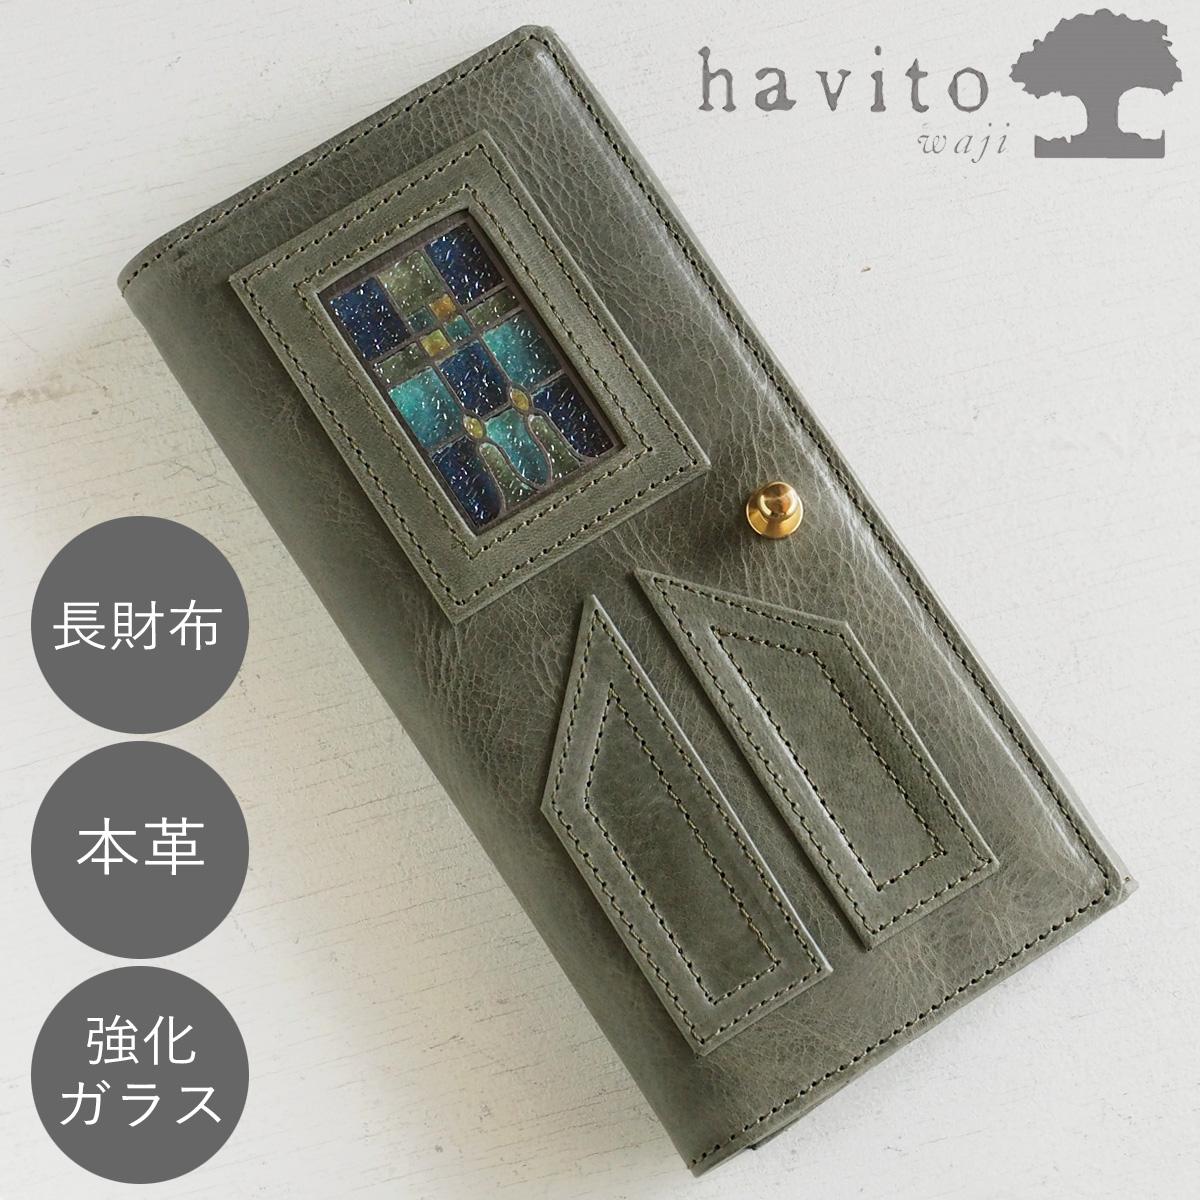 havito(ハビト) glart 長財布 デザイン硝子×オイルレザー アンティークドア カーキ [H0202-KH]